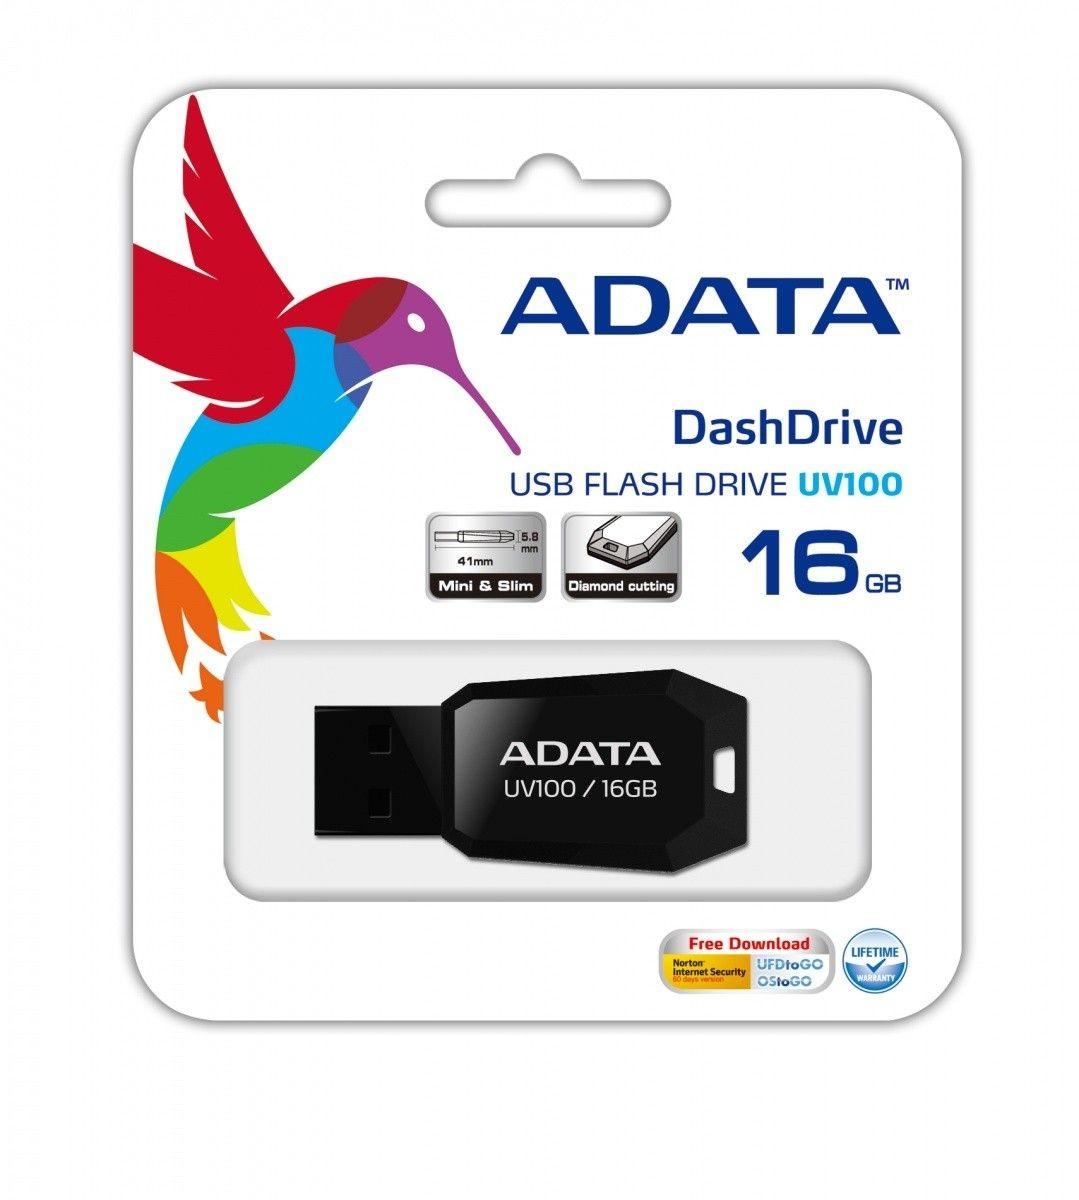 A-Data Adata pamięć USB UV100 16GB USB 2.0 Czarny